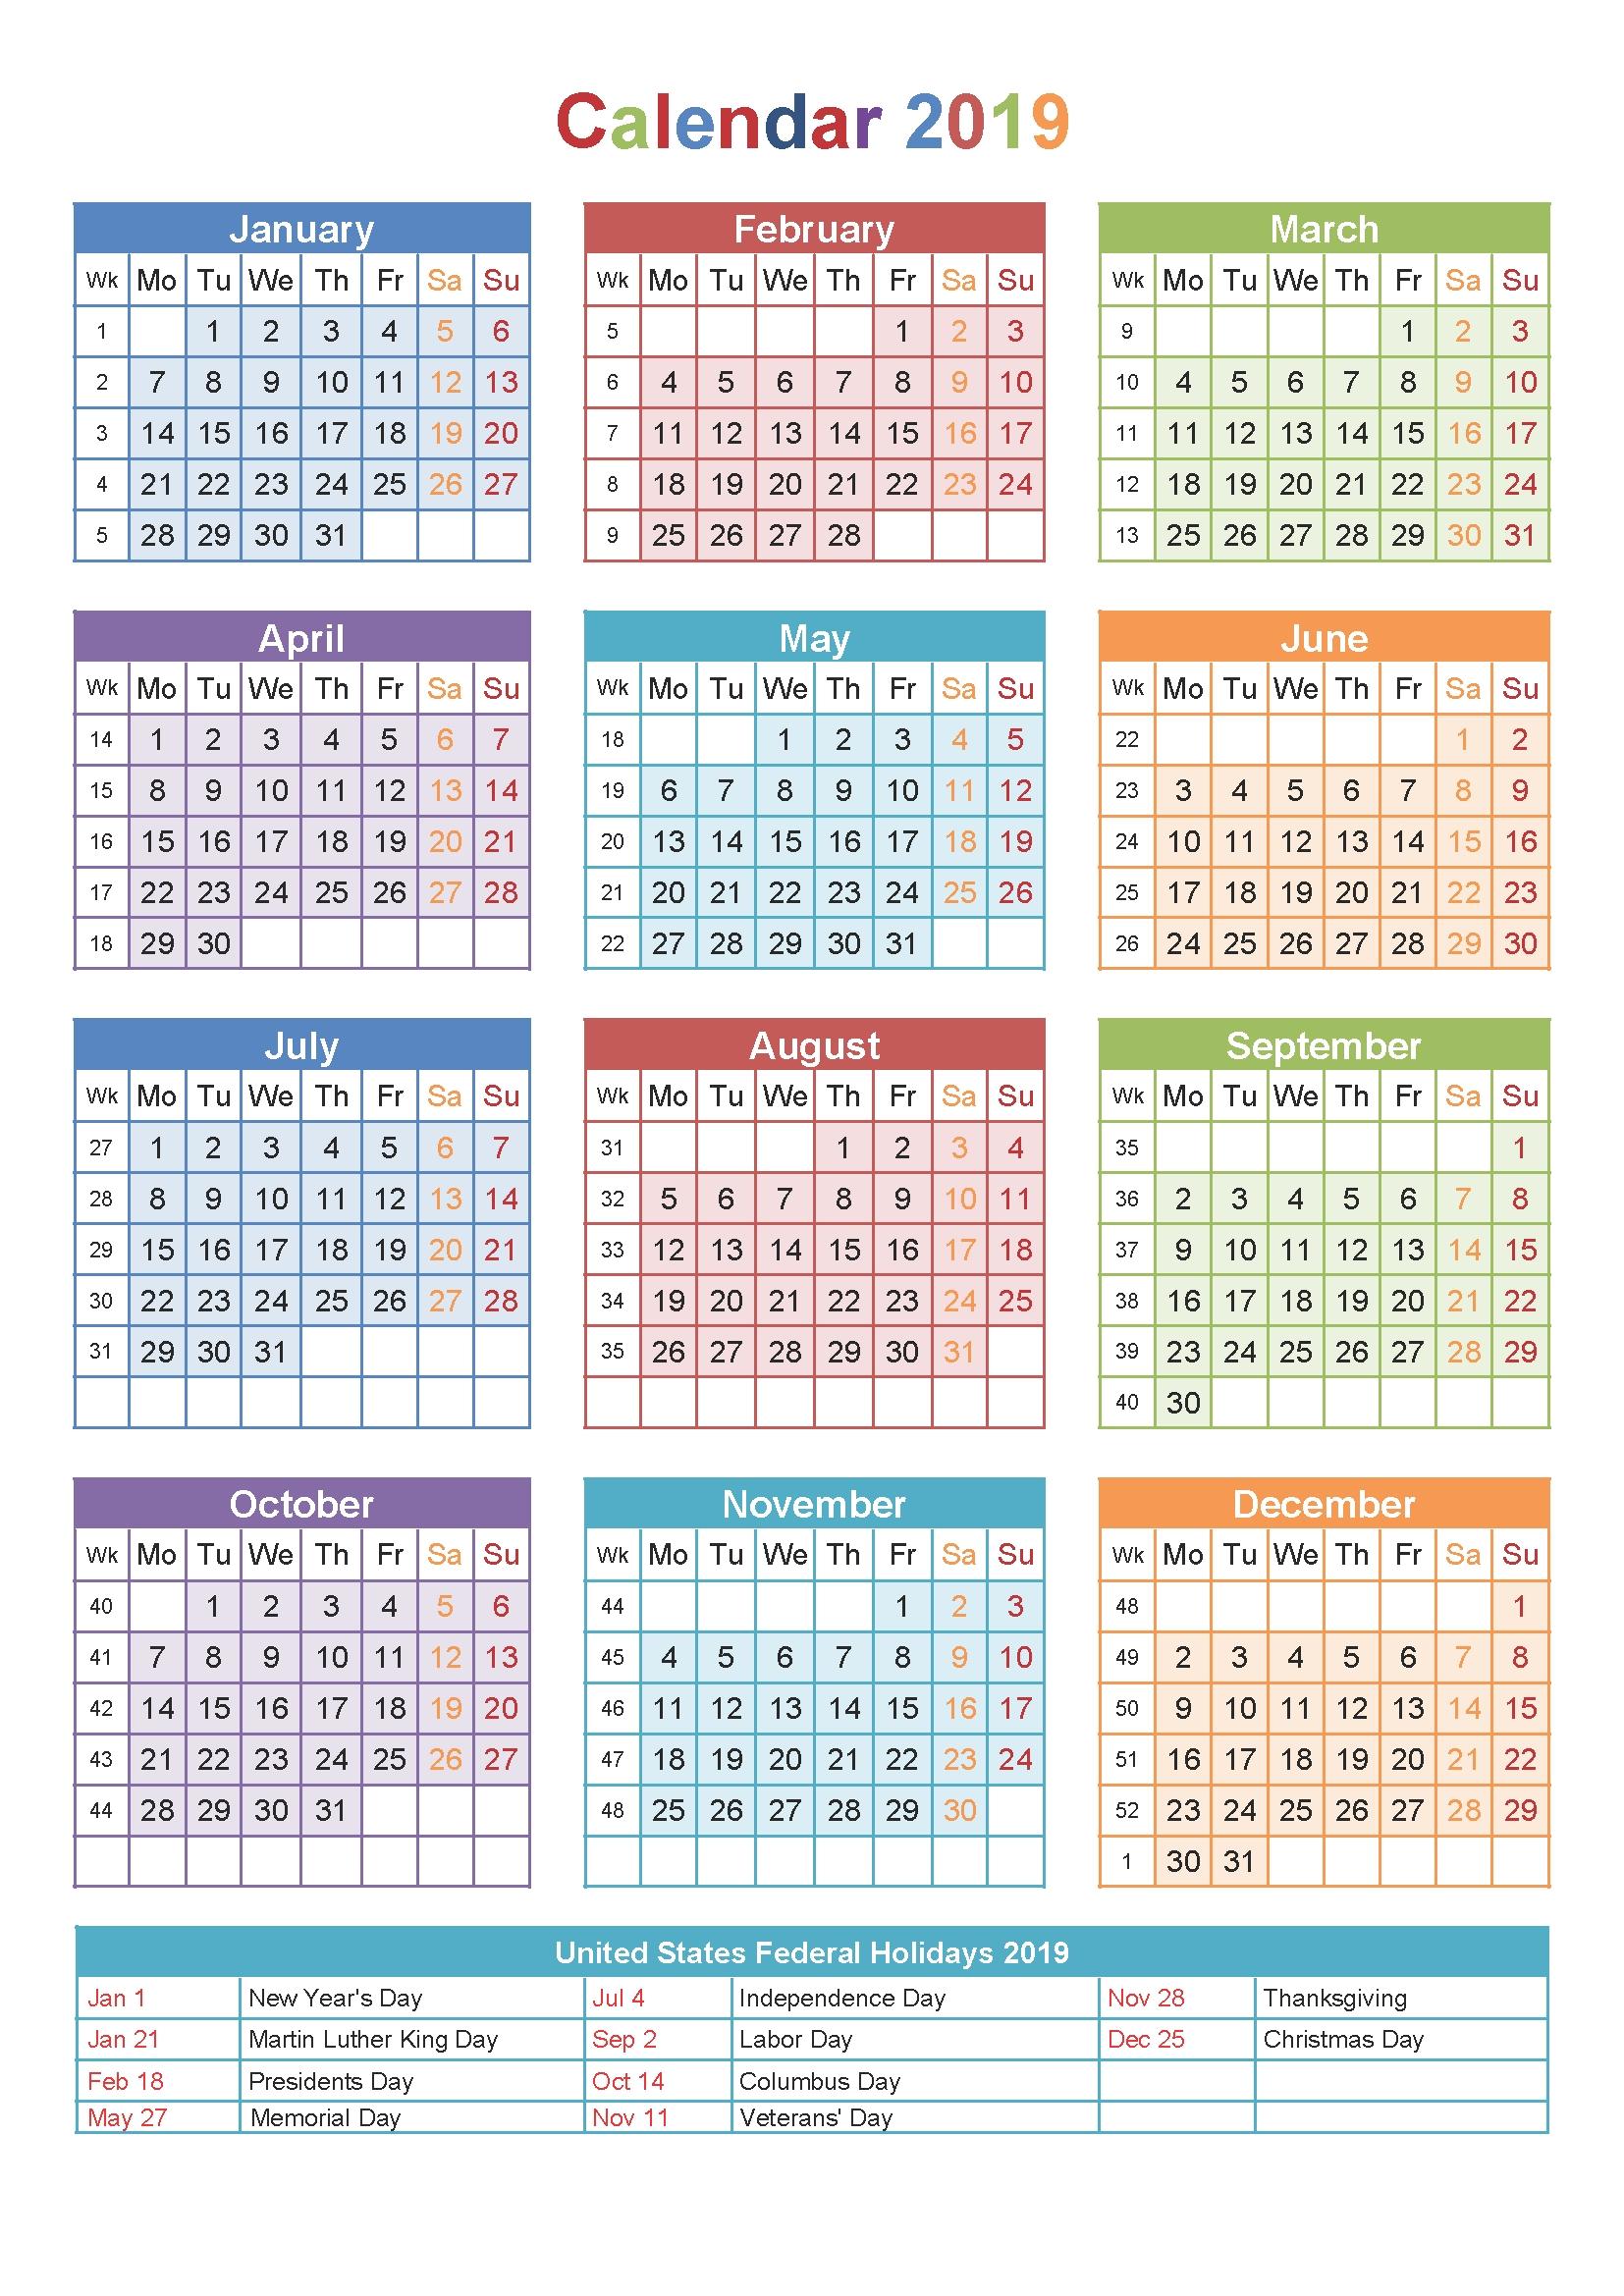 2019 Printable Calendar Templates - Blank Word Pdf - 2018 Calendar Calendar 2019 Small Printable